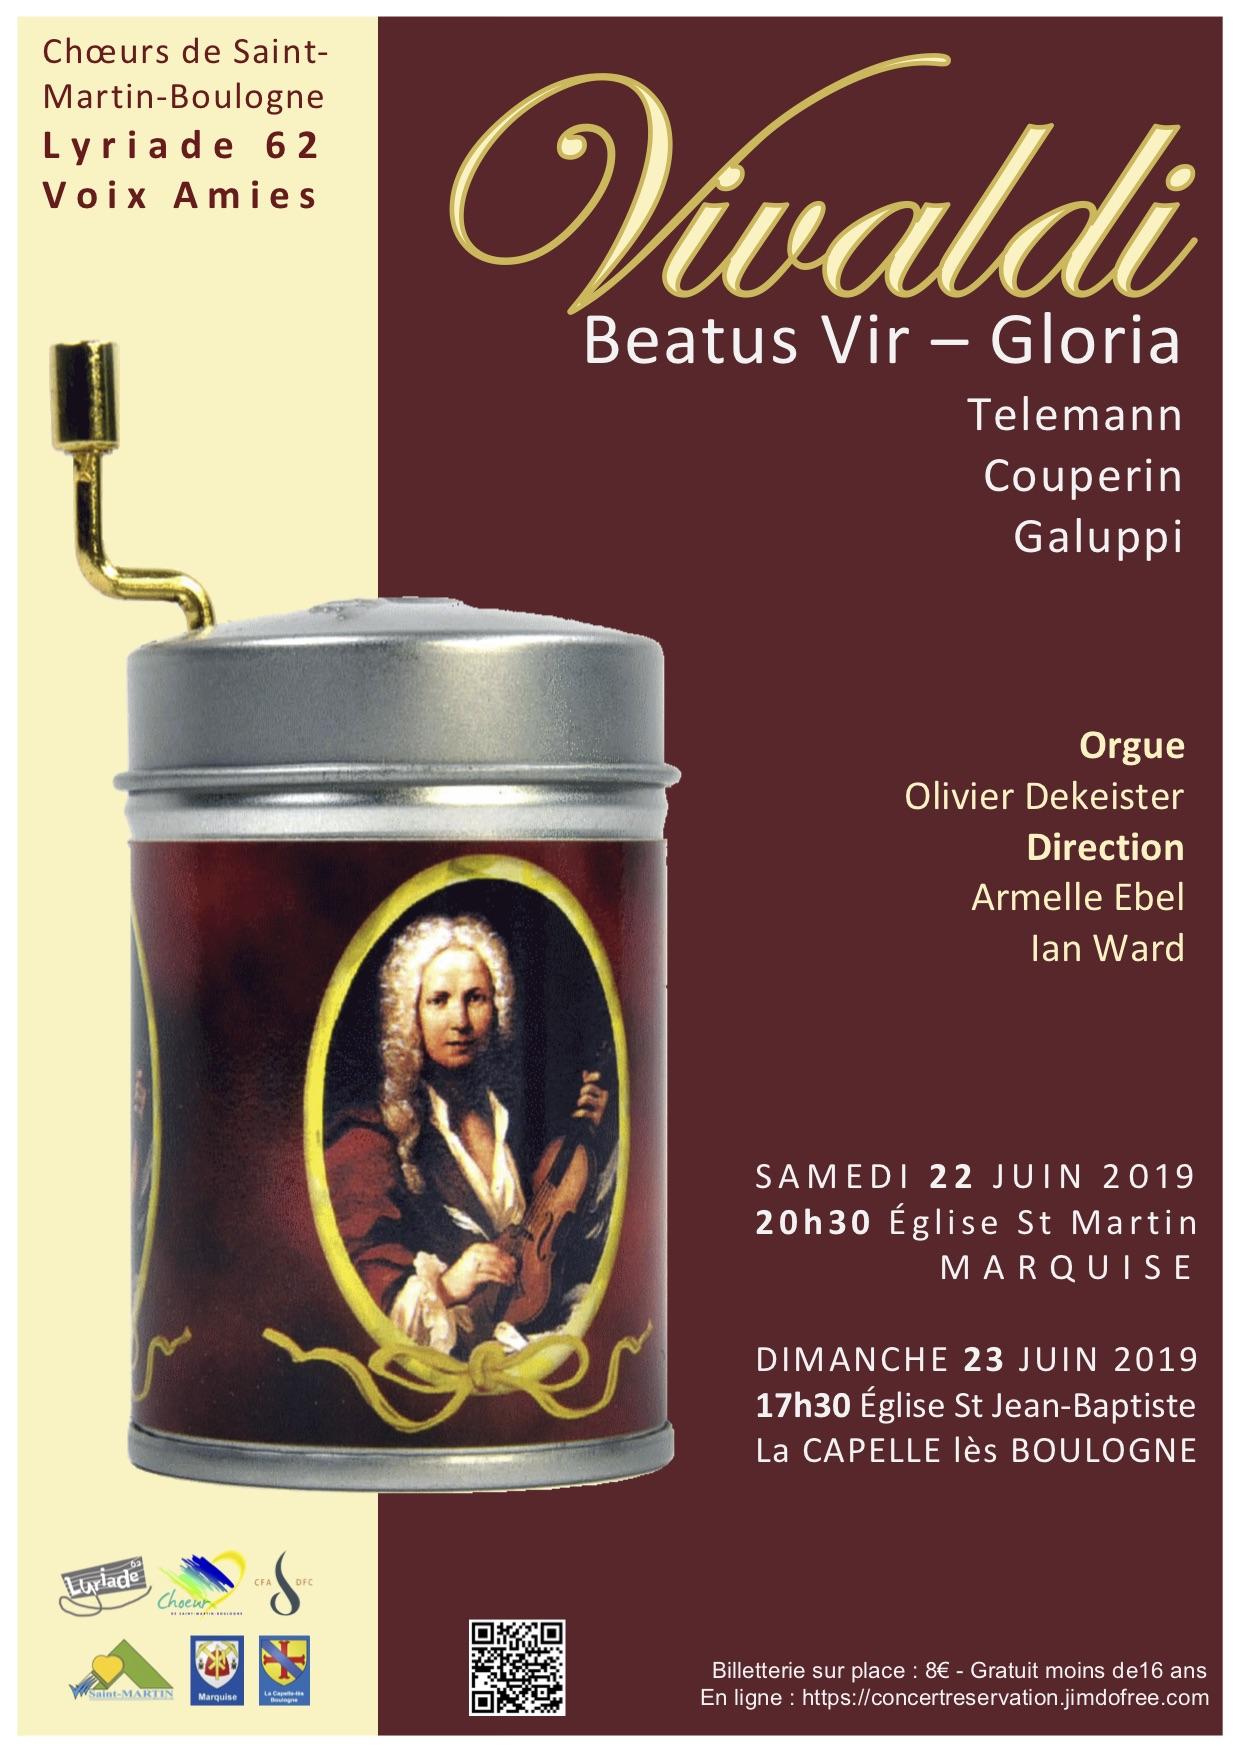 affiche concert vivaldi marquise 19 juin